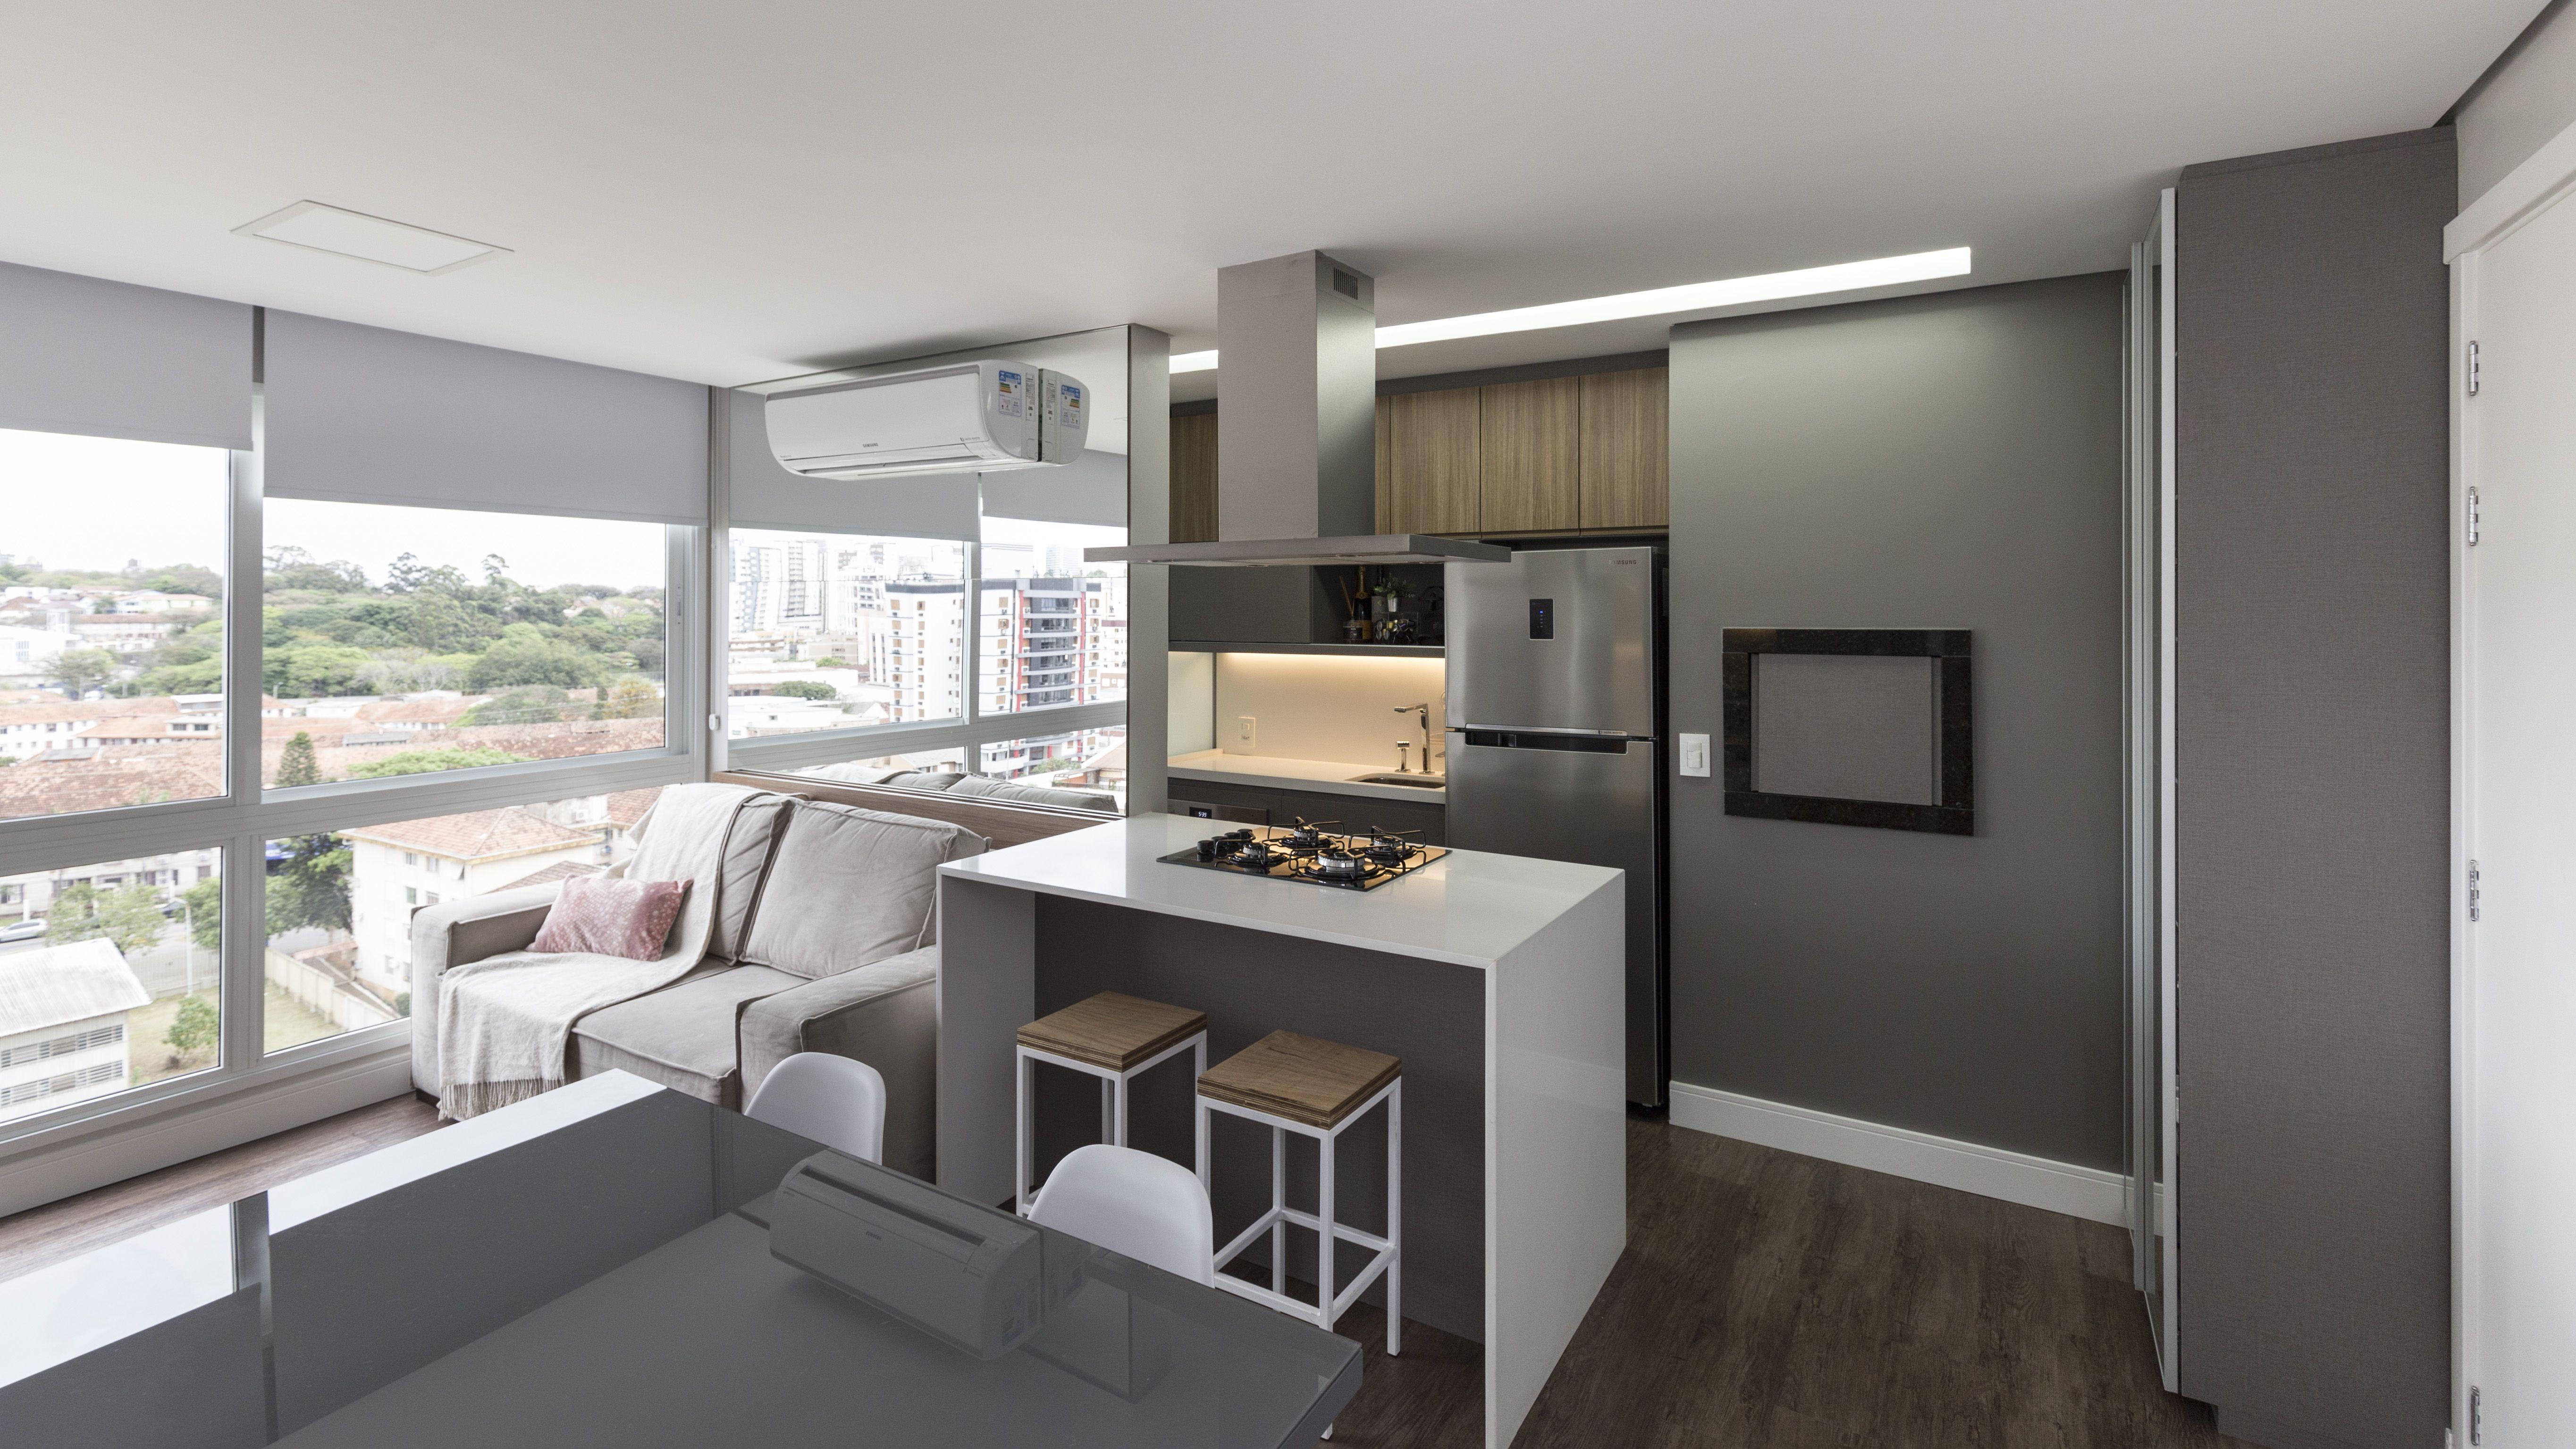 Bancada Que Une Sala De Jantar A Cozinha Moderna E Funcional